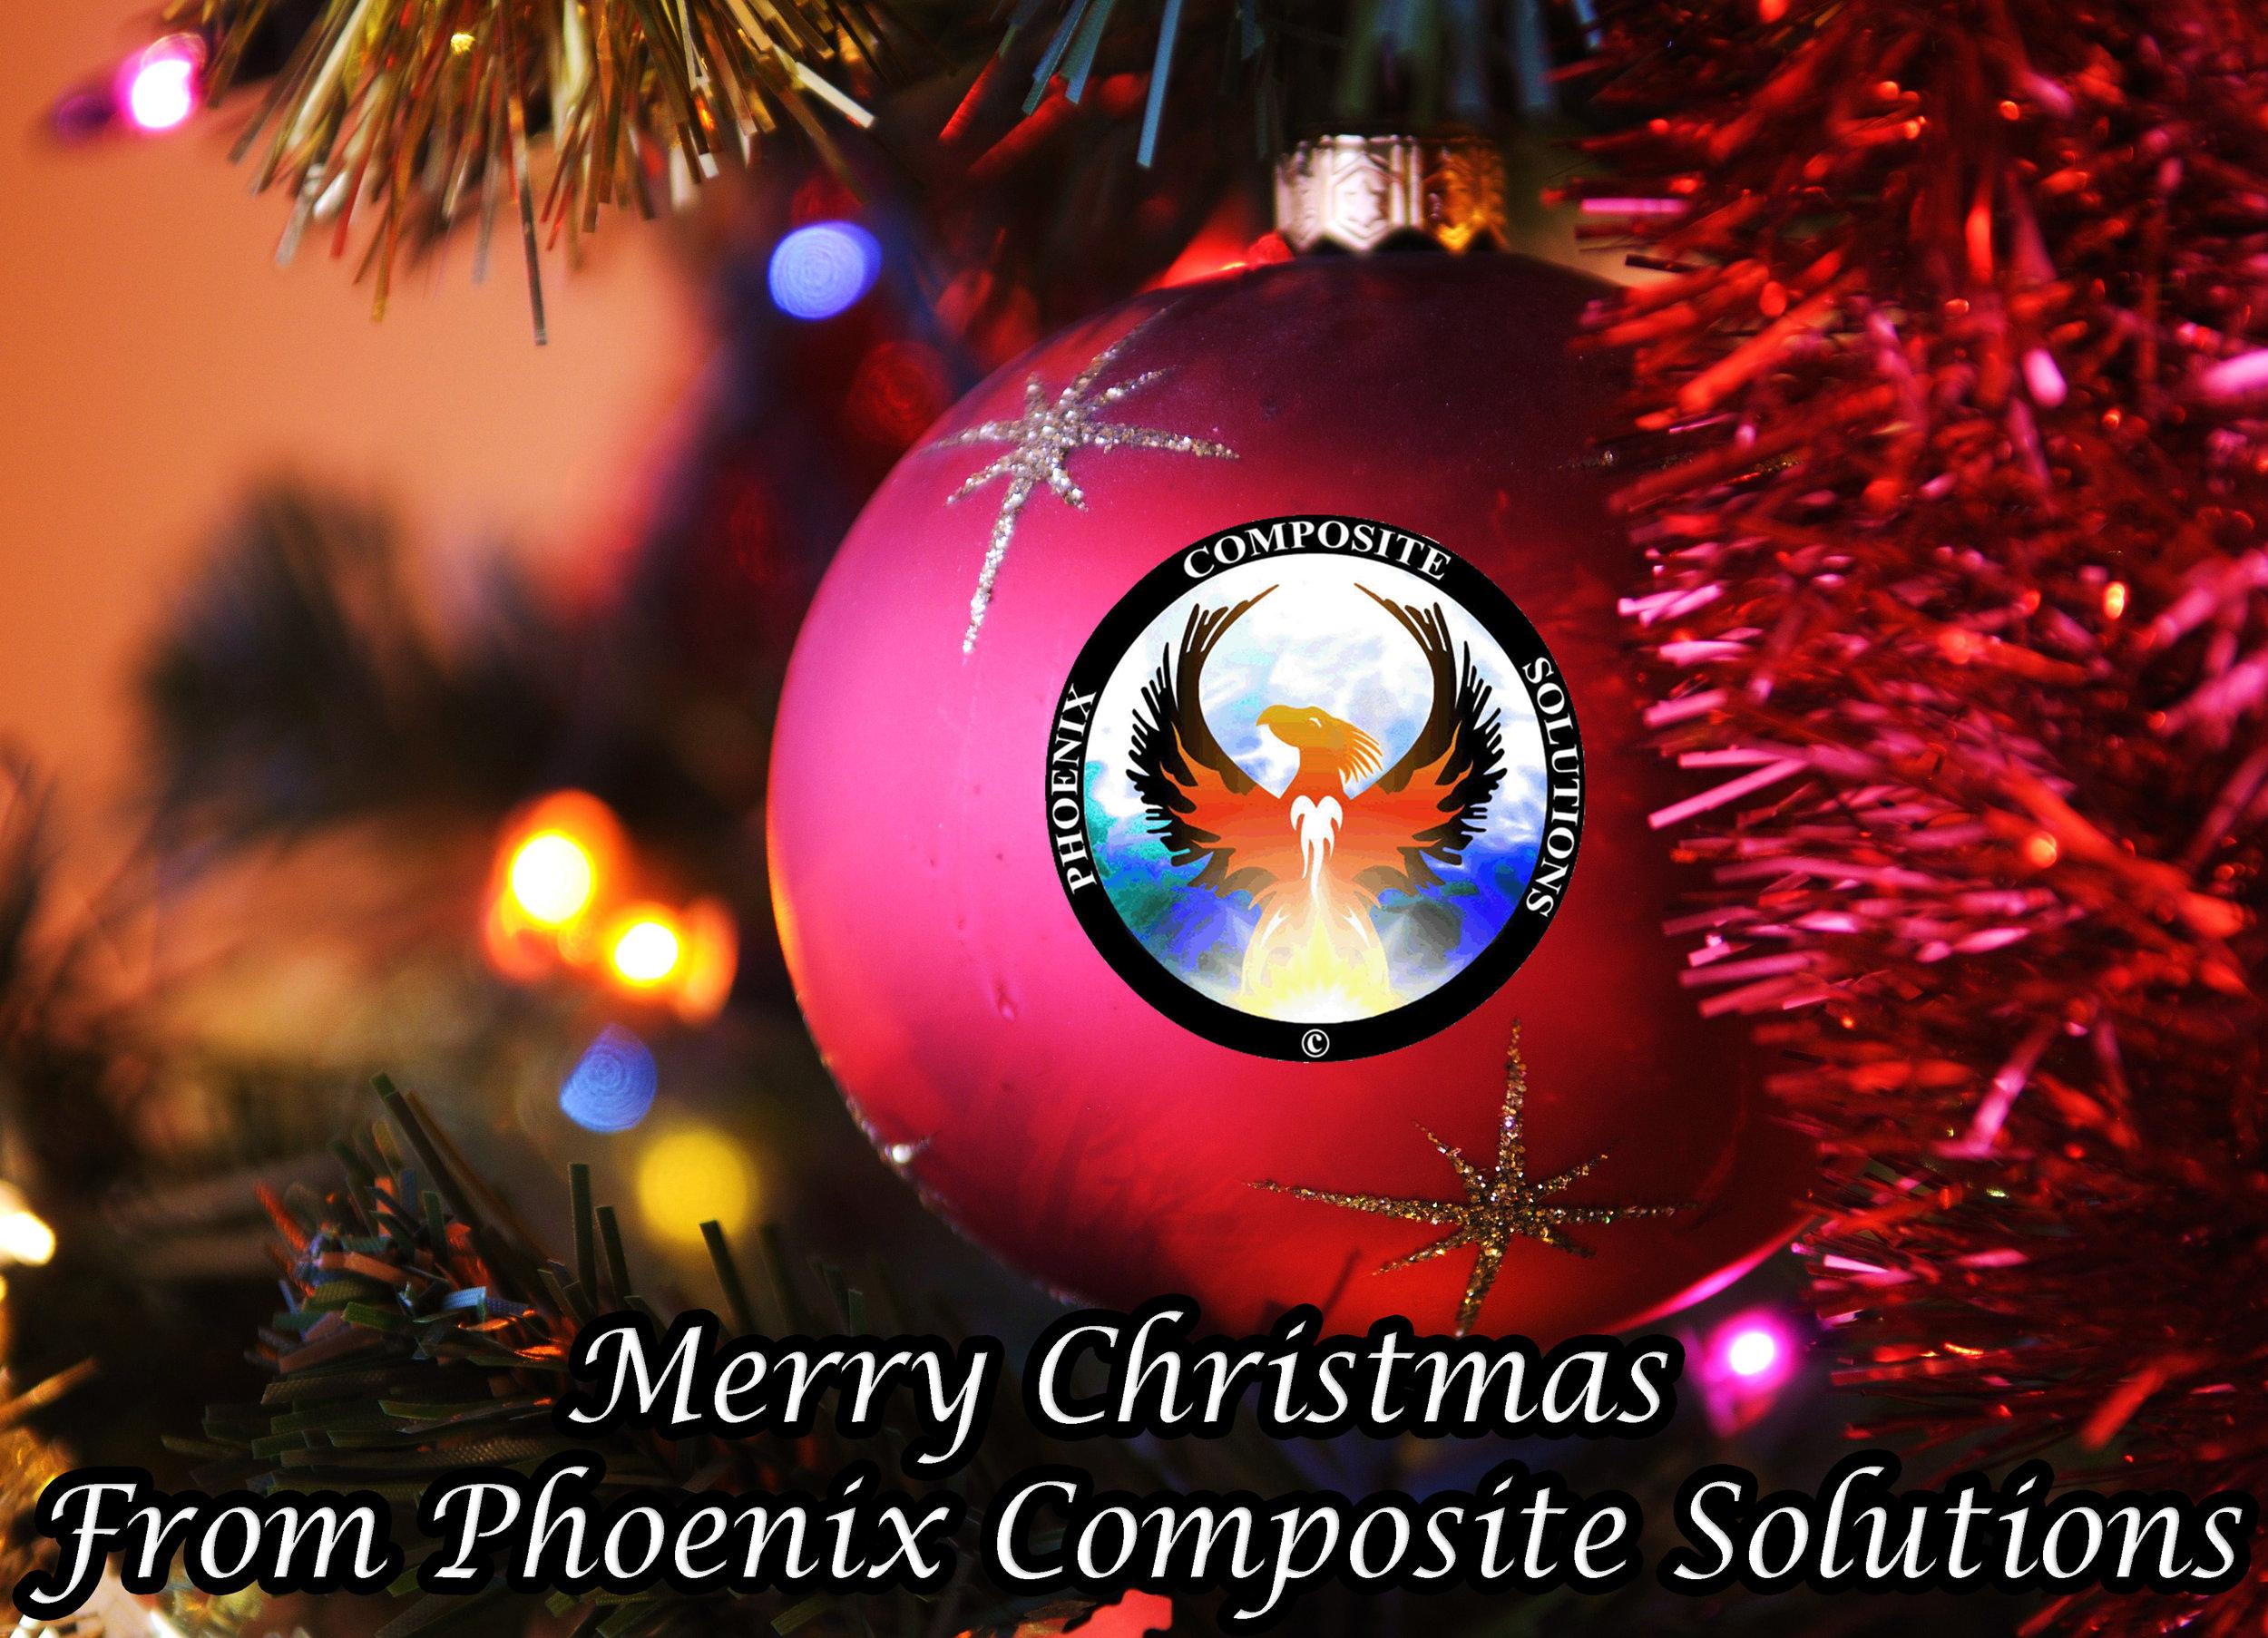 Christmas_tree_red_bauble8888.jpg